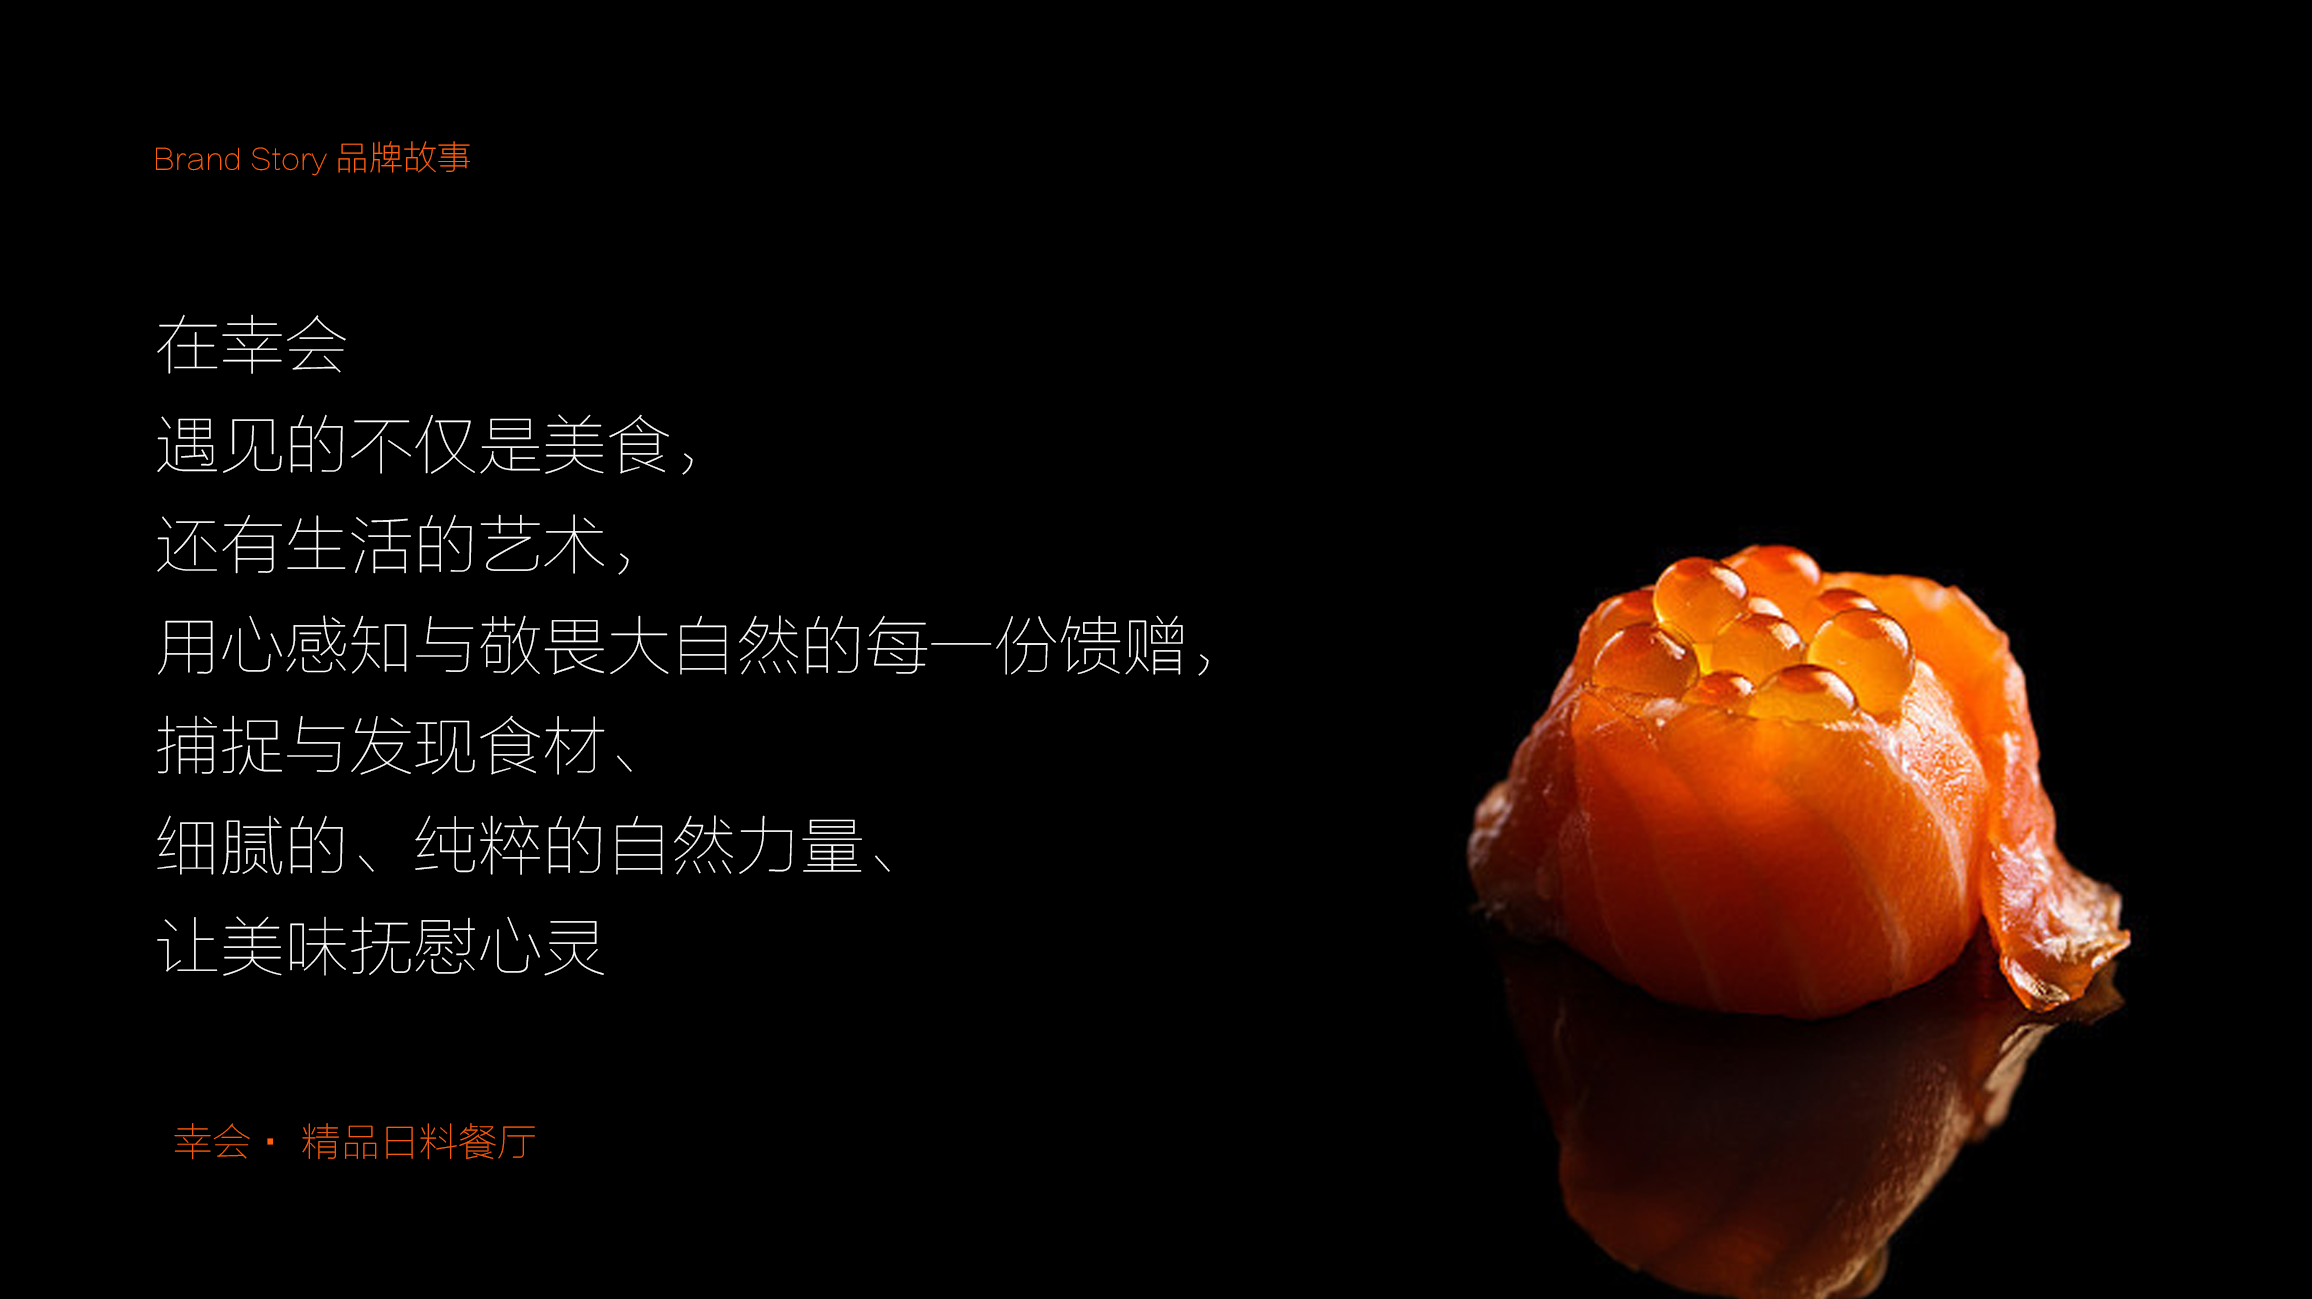 xinghui